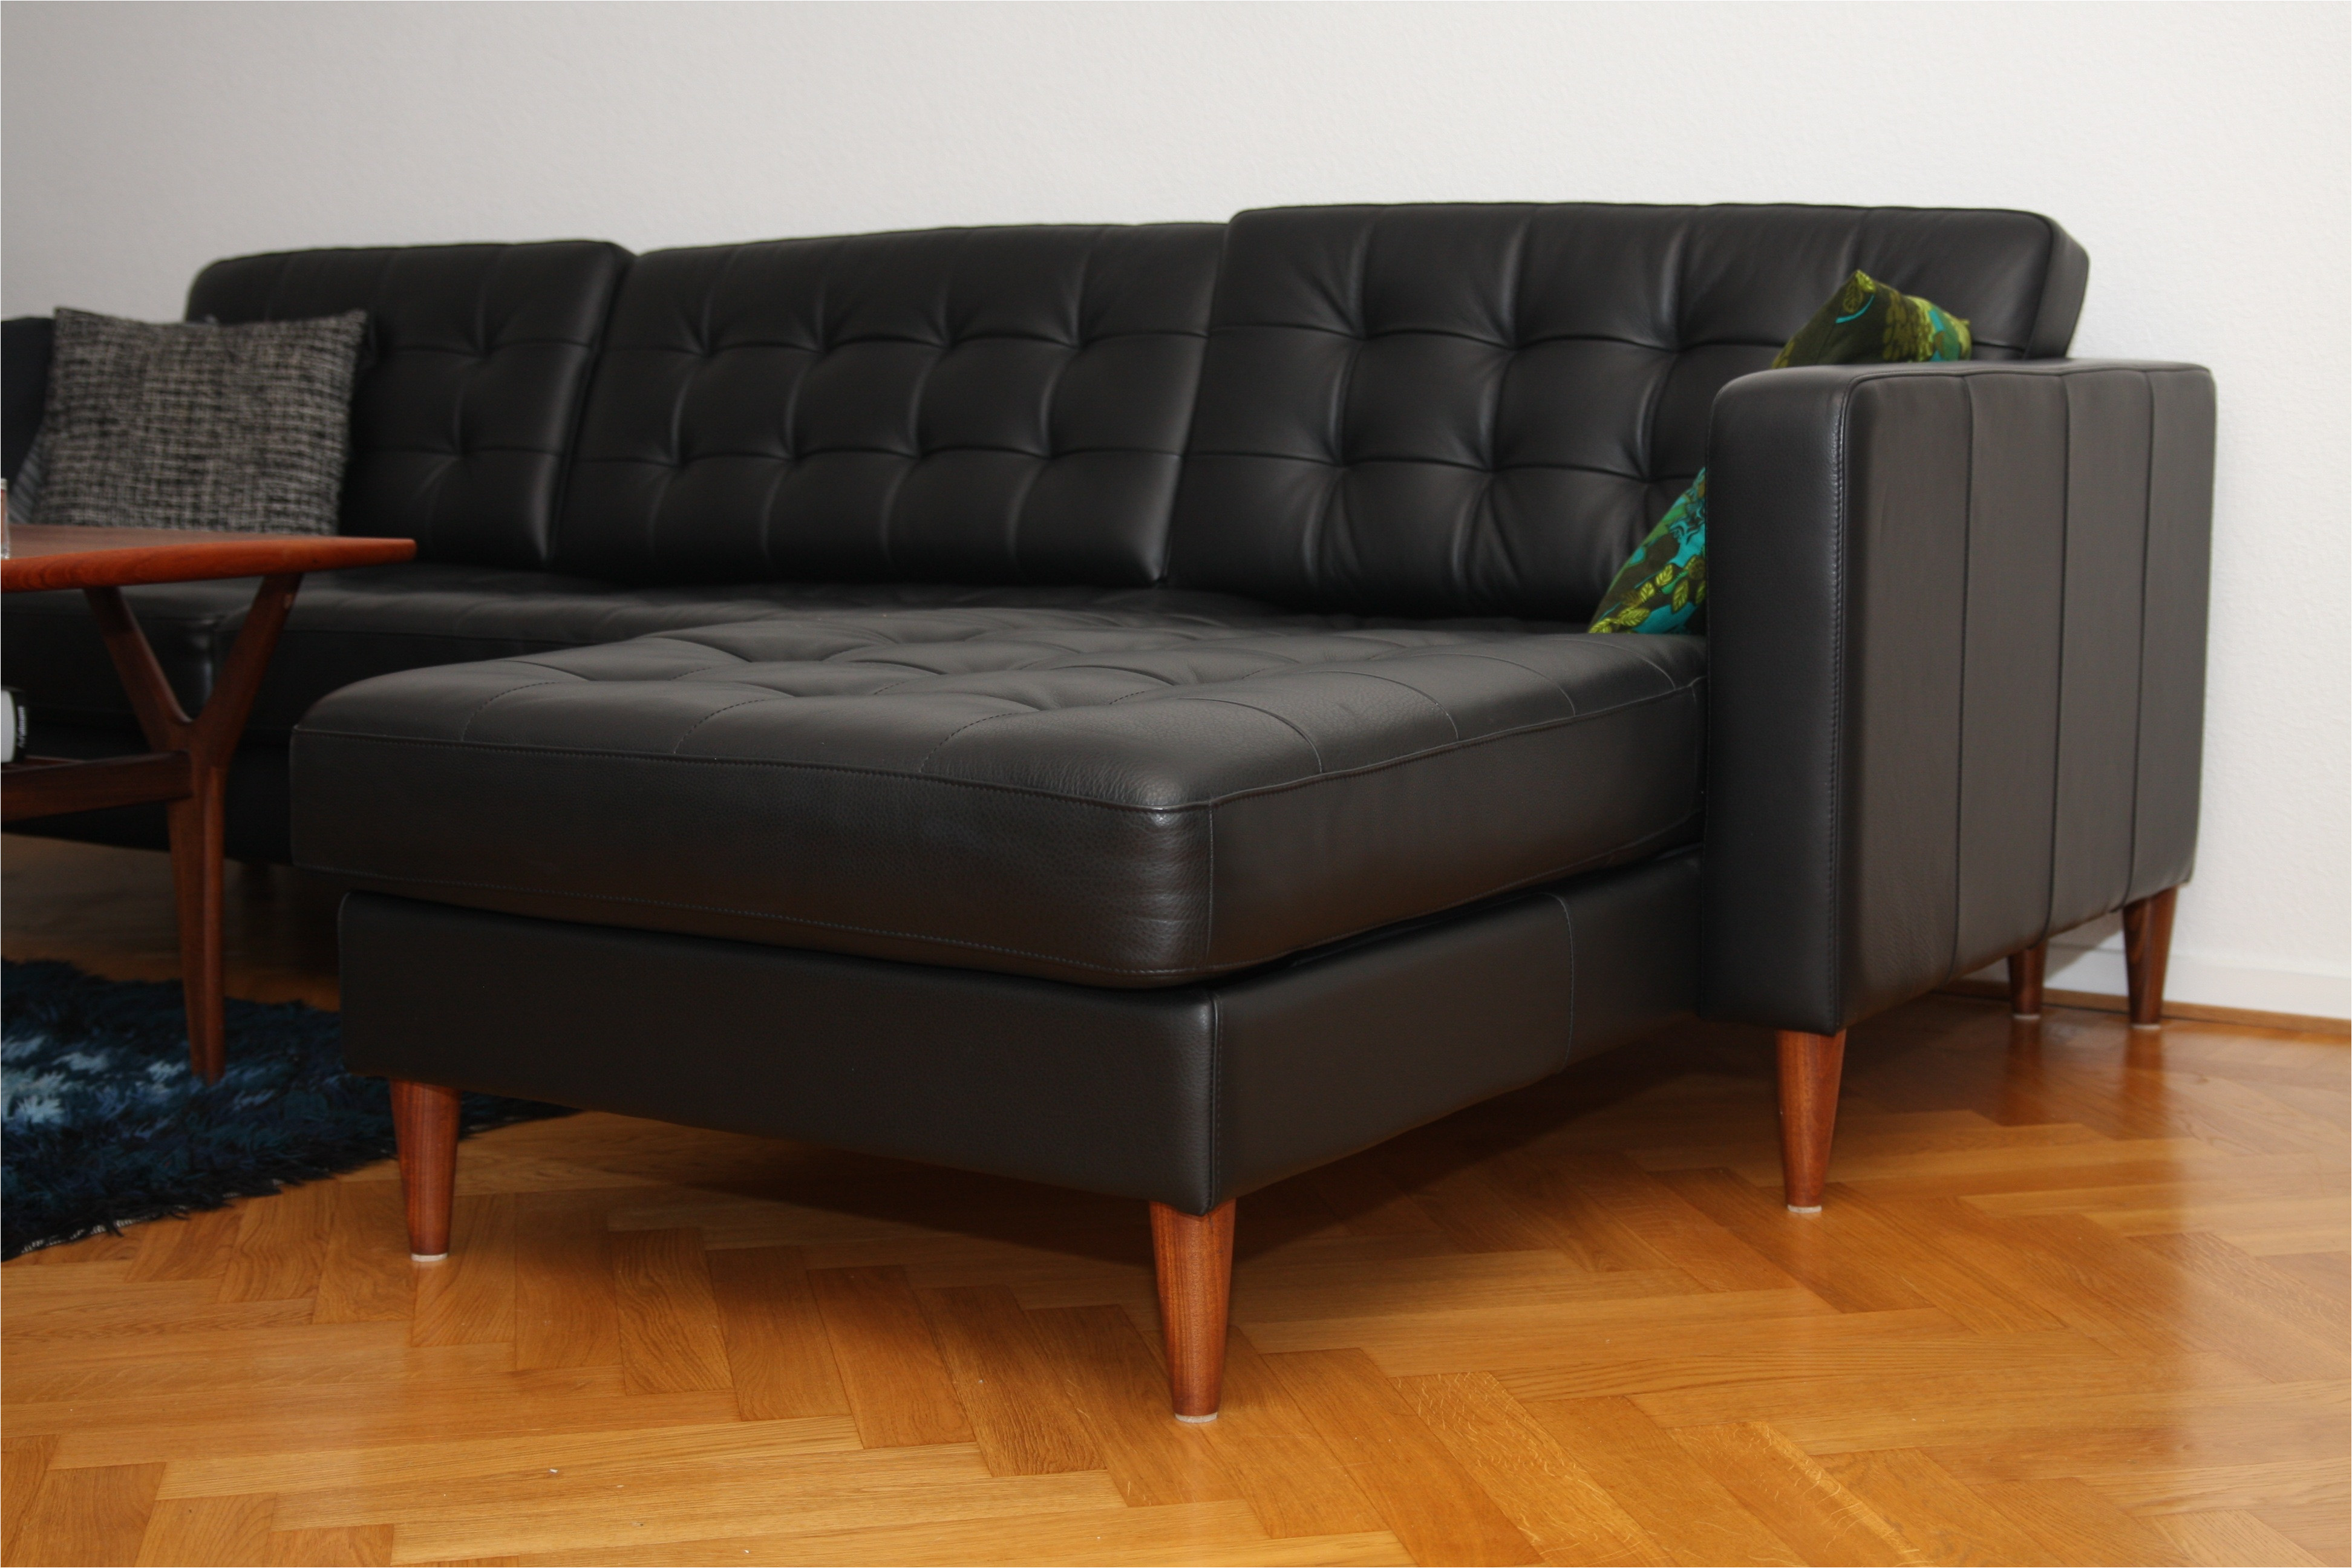 ikea schlafsofa friheten luxus amazing ikea karlstad sofa leather 8 review reviewstadikea bilder